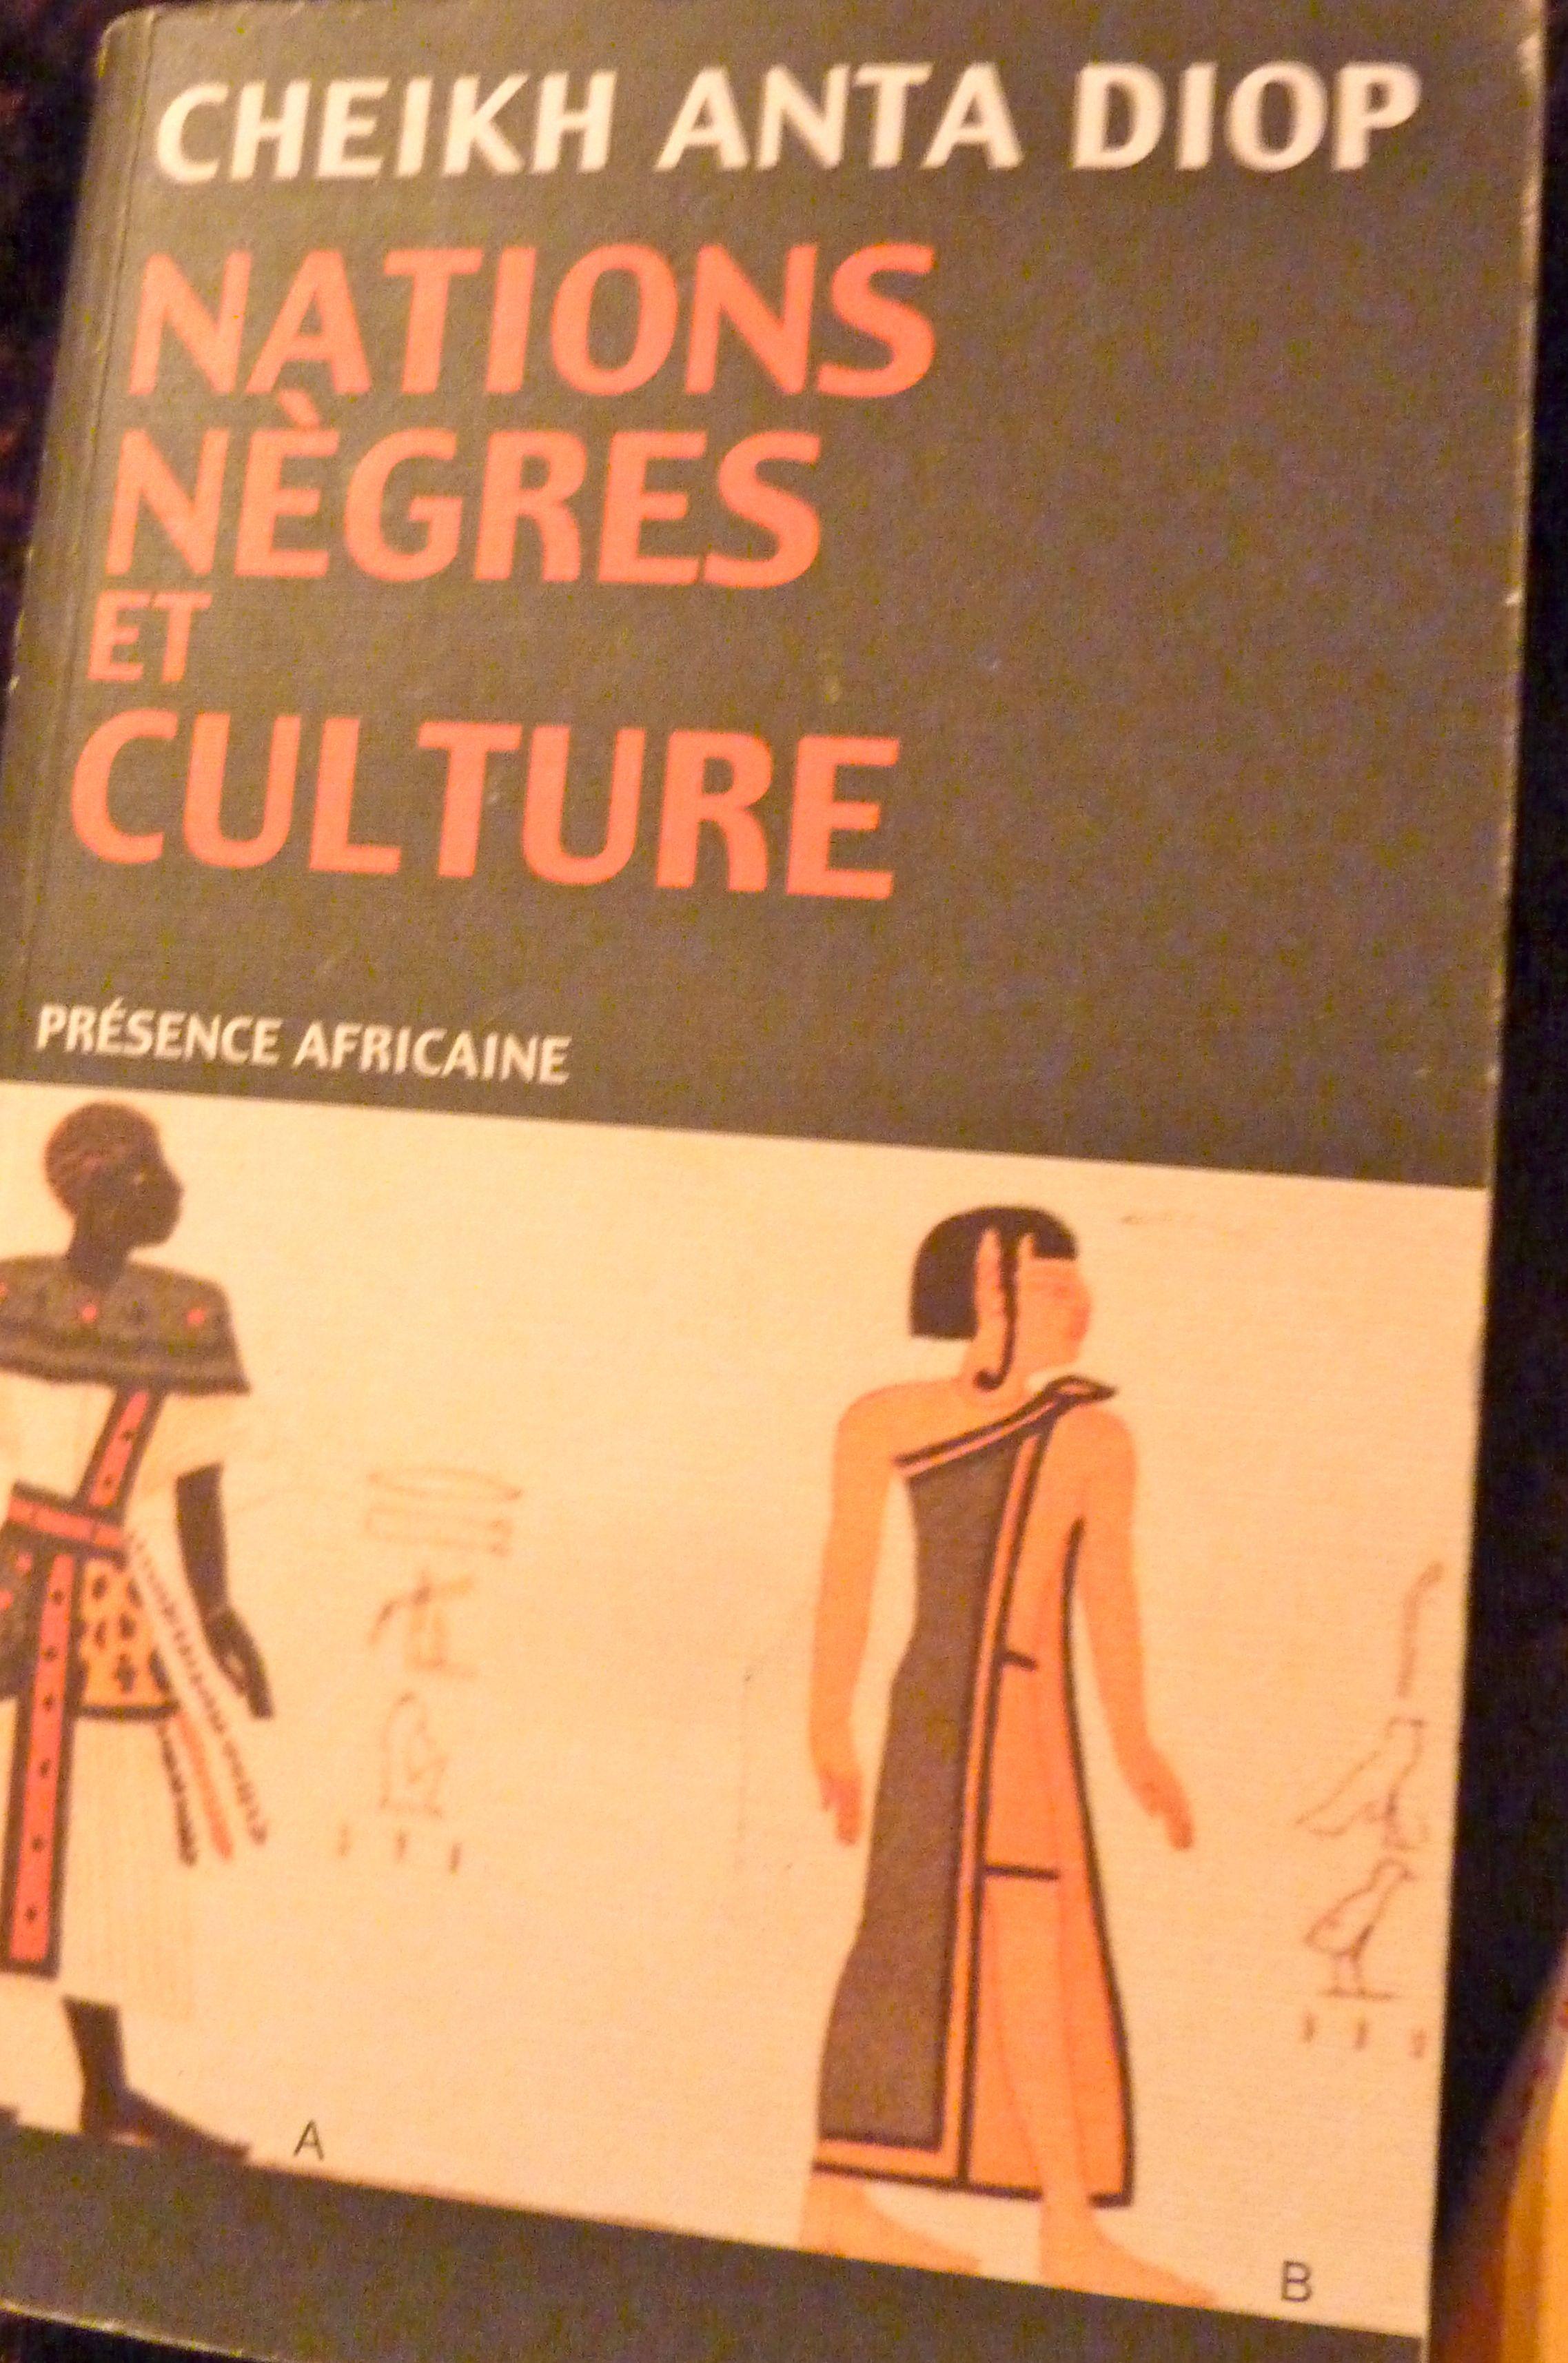 Cheikh Anta Diop Litterature Africaine Lecture Litterature